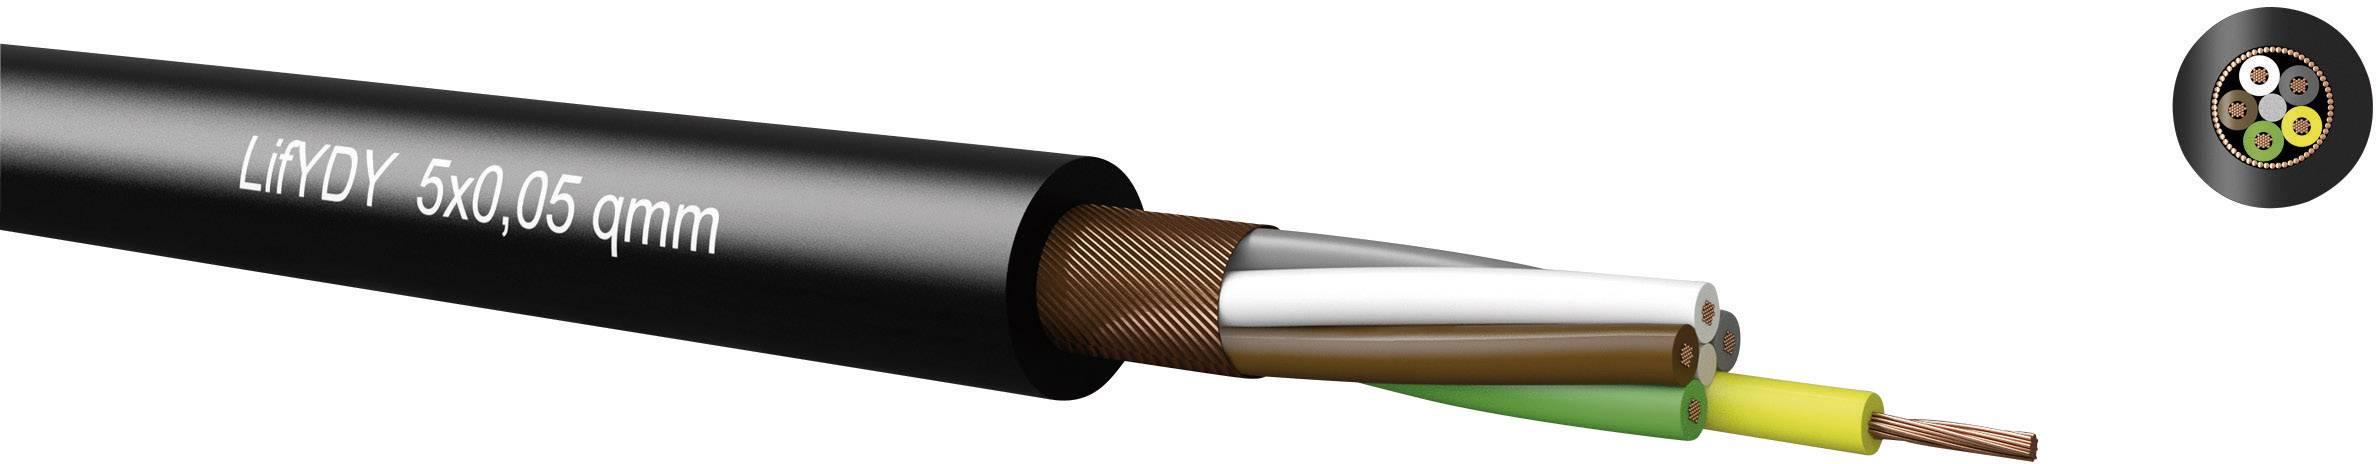 Riadiaci kábel Kabeltronik LifYDY 340801000, 8 x 0.10 mm², vonkajší Ø 4.90 mm, 300 V, metrový tovar, čierna